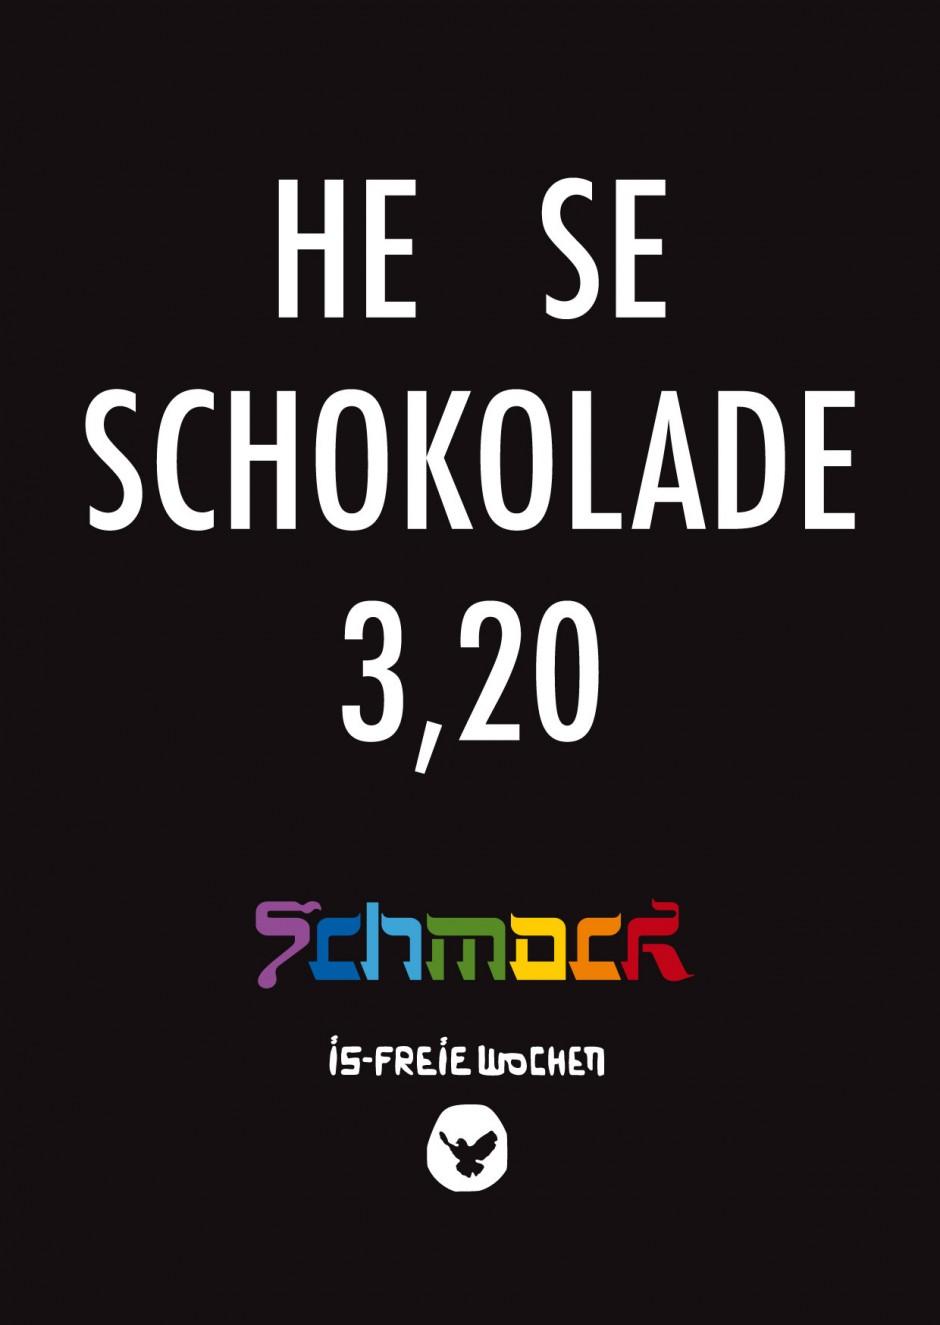 KR_141103_Schmock_02